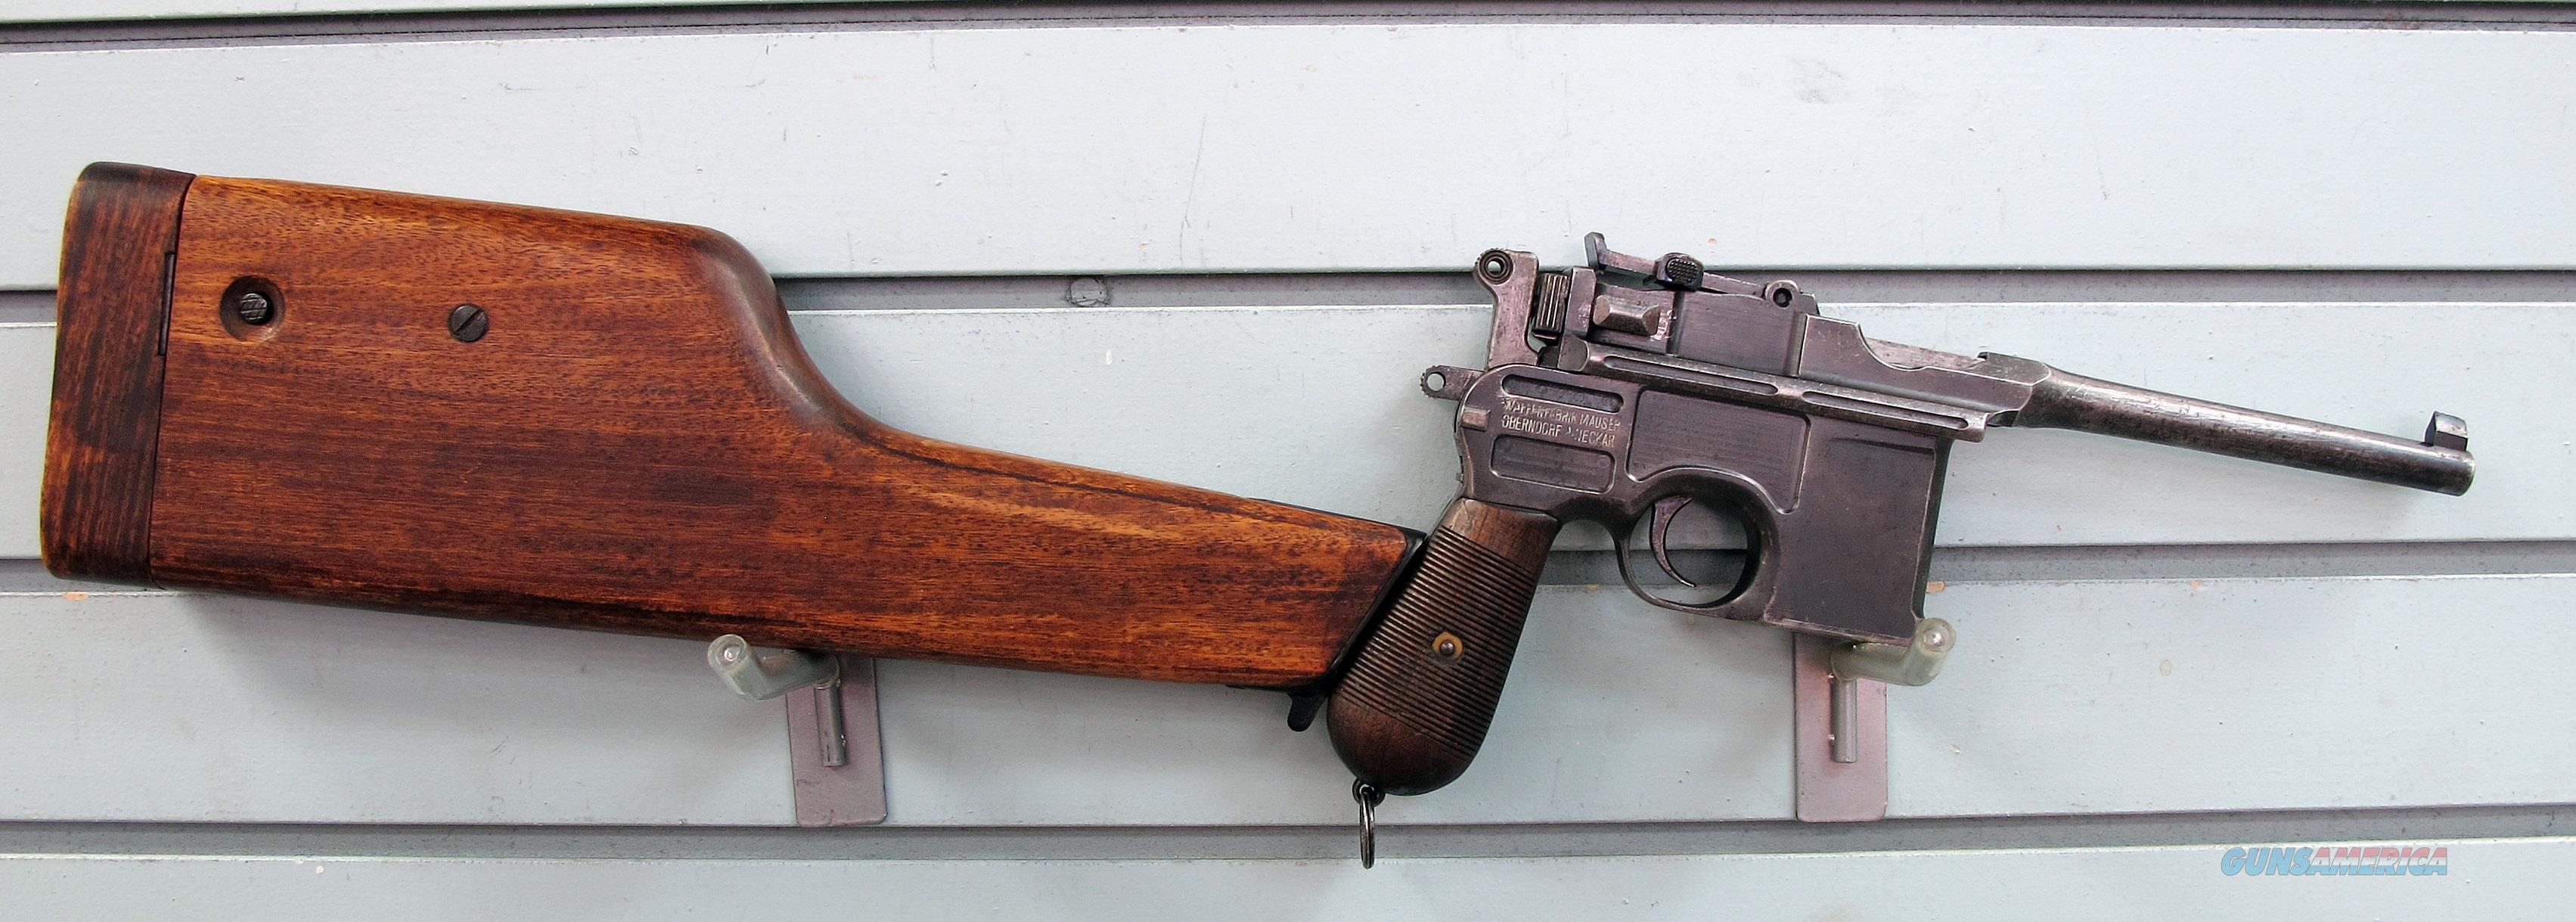 MAUSER BROOM HANDLE 30 MAUSER  Guns > Pistols > Mauser Pistols